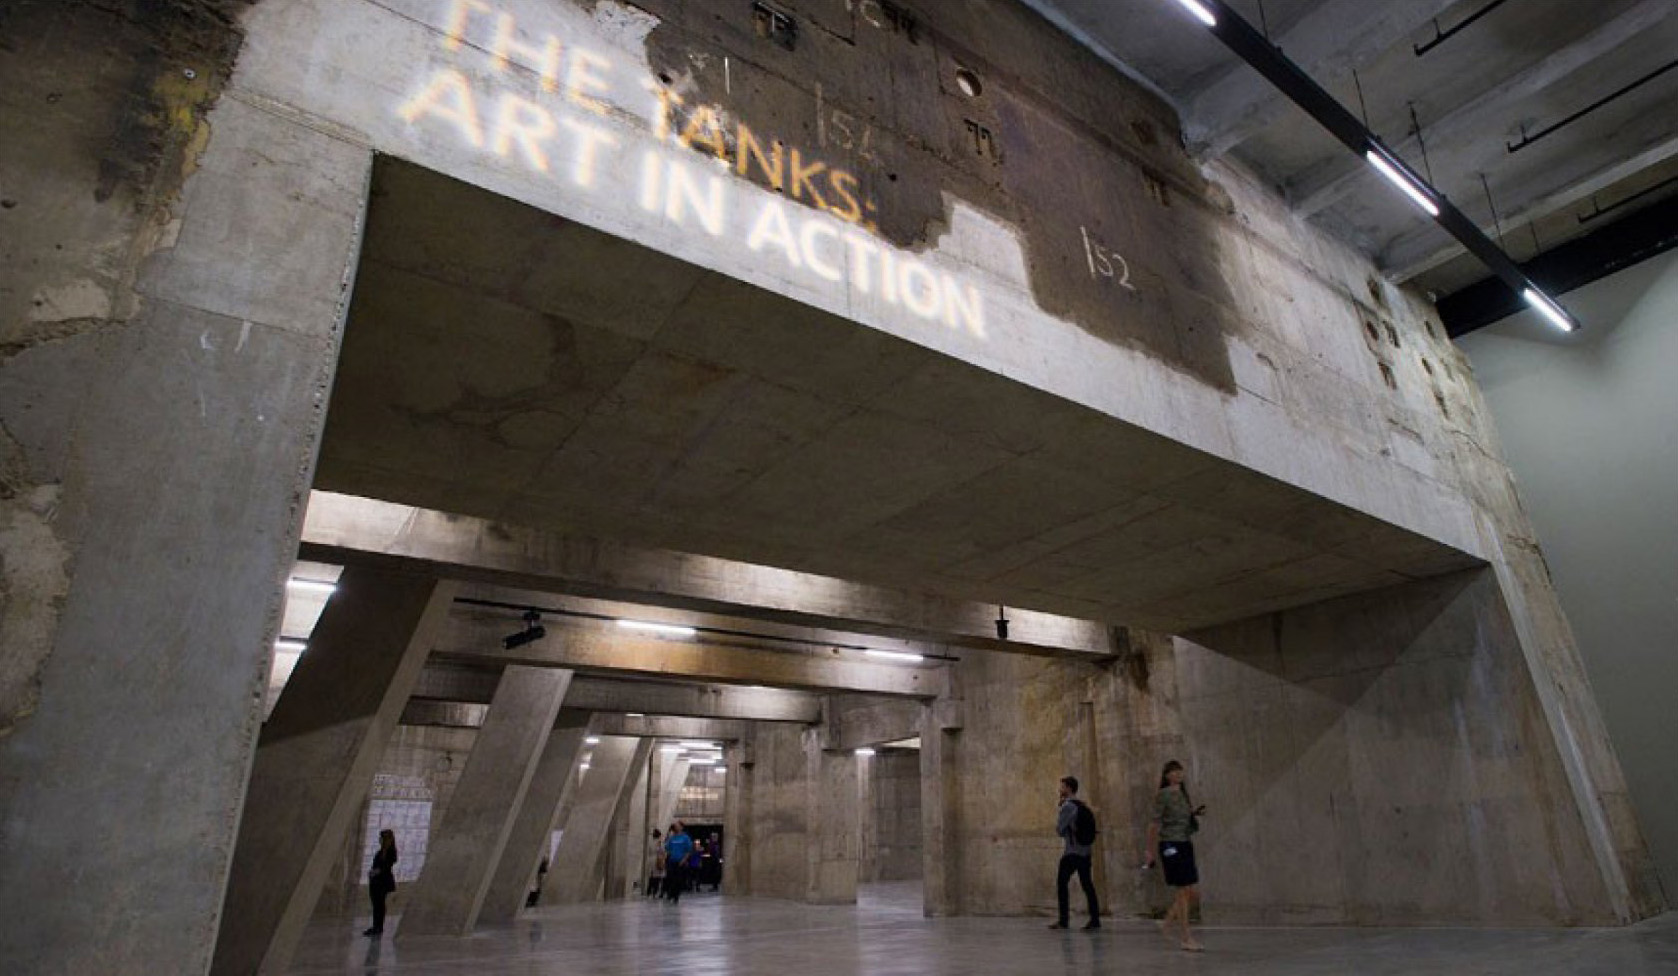 The Tanks Foyer en la Tate Modern